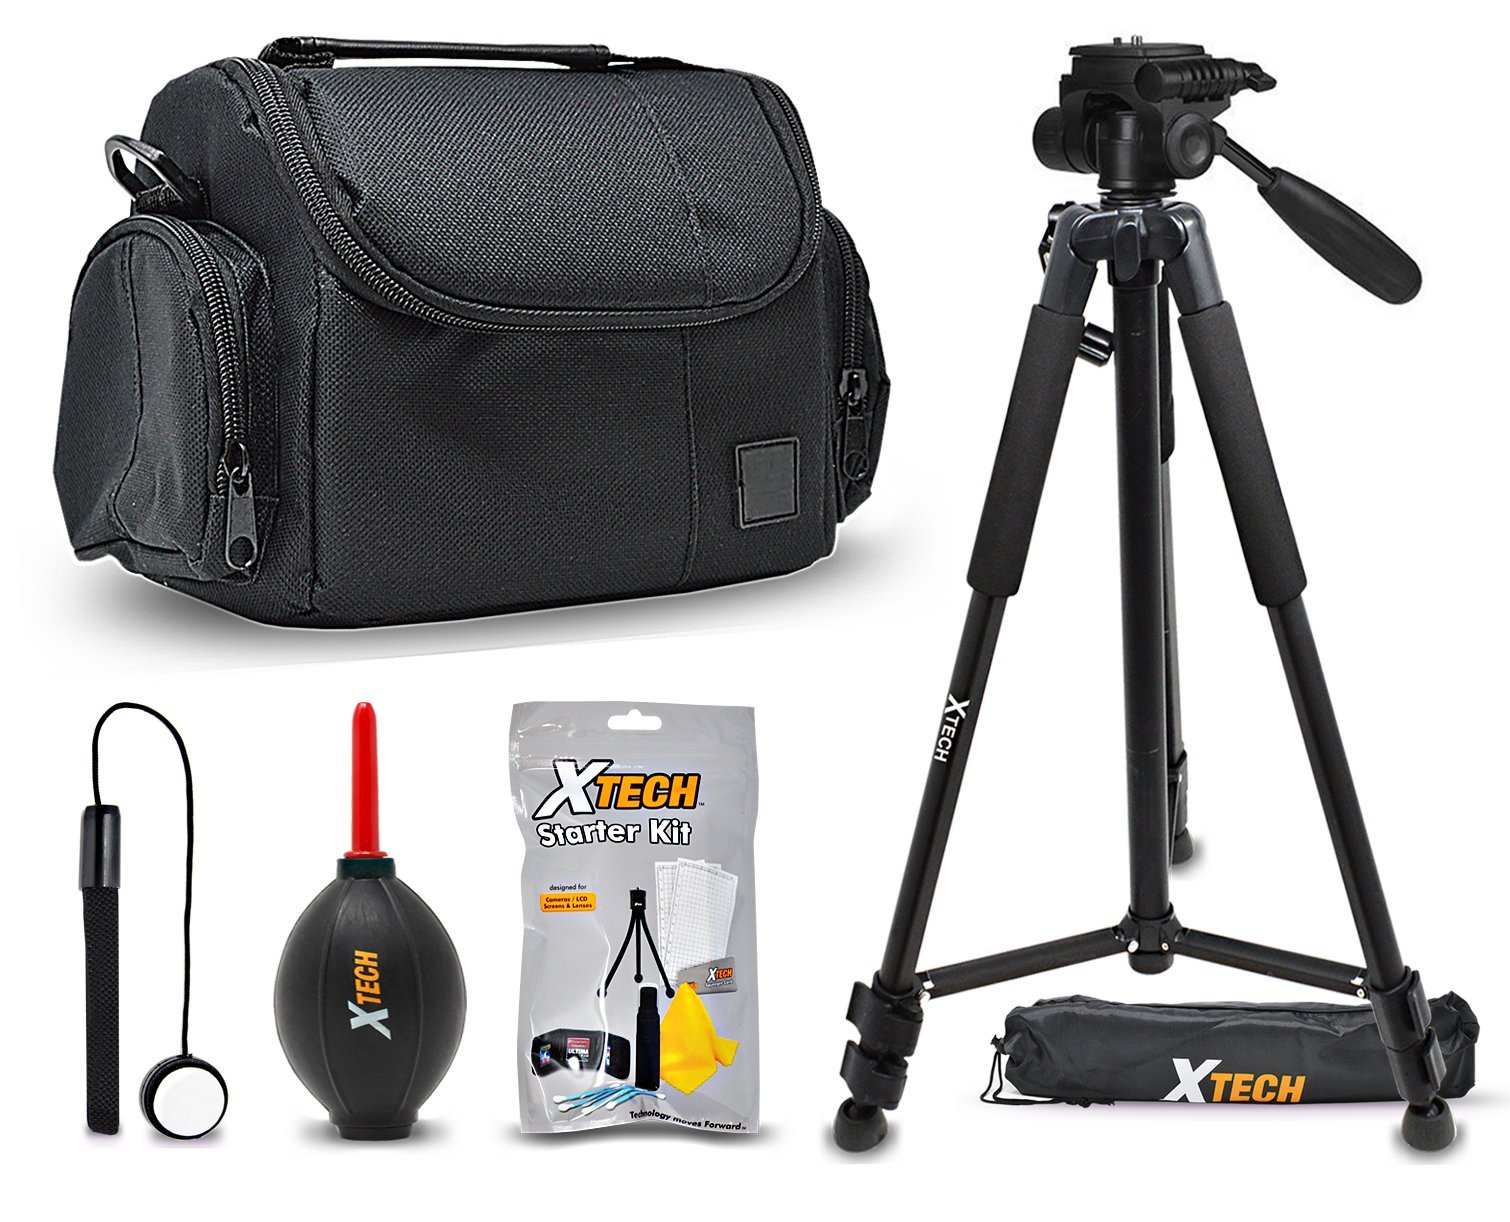 Xtech Premium Camera Case + Pro Series 72' inch Tripod for Sony Alpha A9, A7R II, A7 II, A7 A7R A7S A6500 A6300 A6000 A55 A65 A77 A99 A900 A700 A580 A560 A550 A500 A450 A390 A380, NEX-7 NEX-6 Cameras